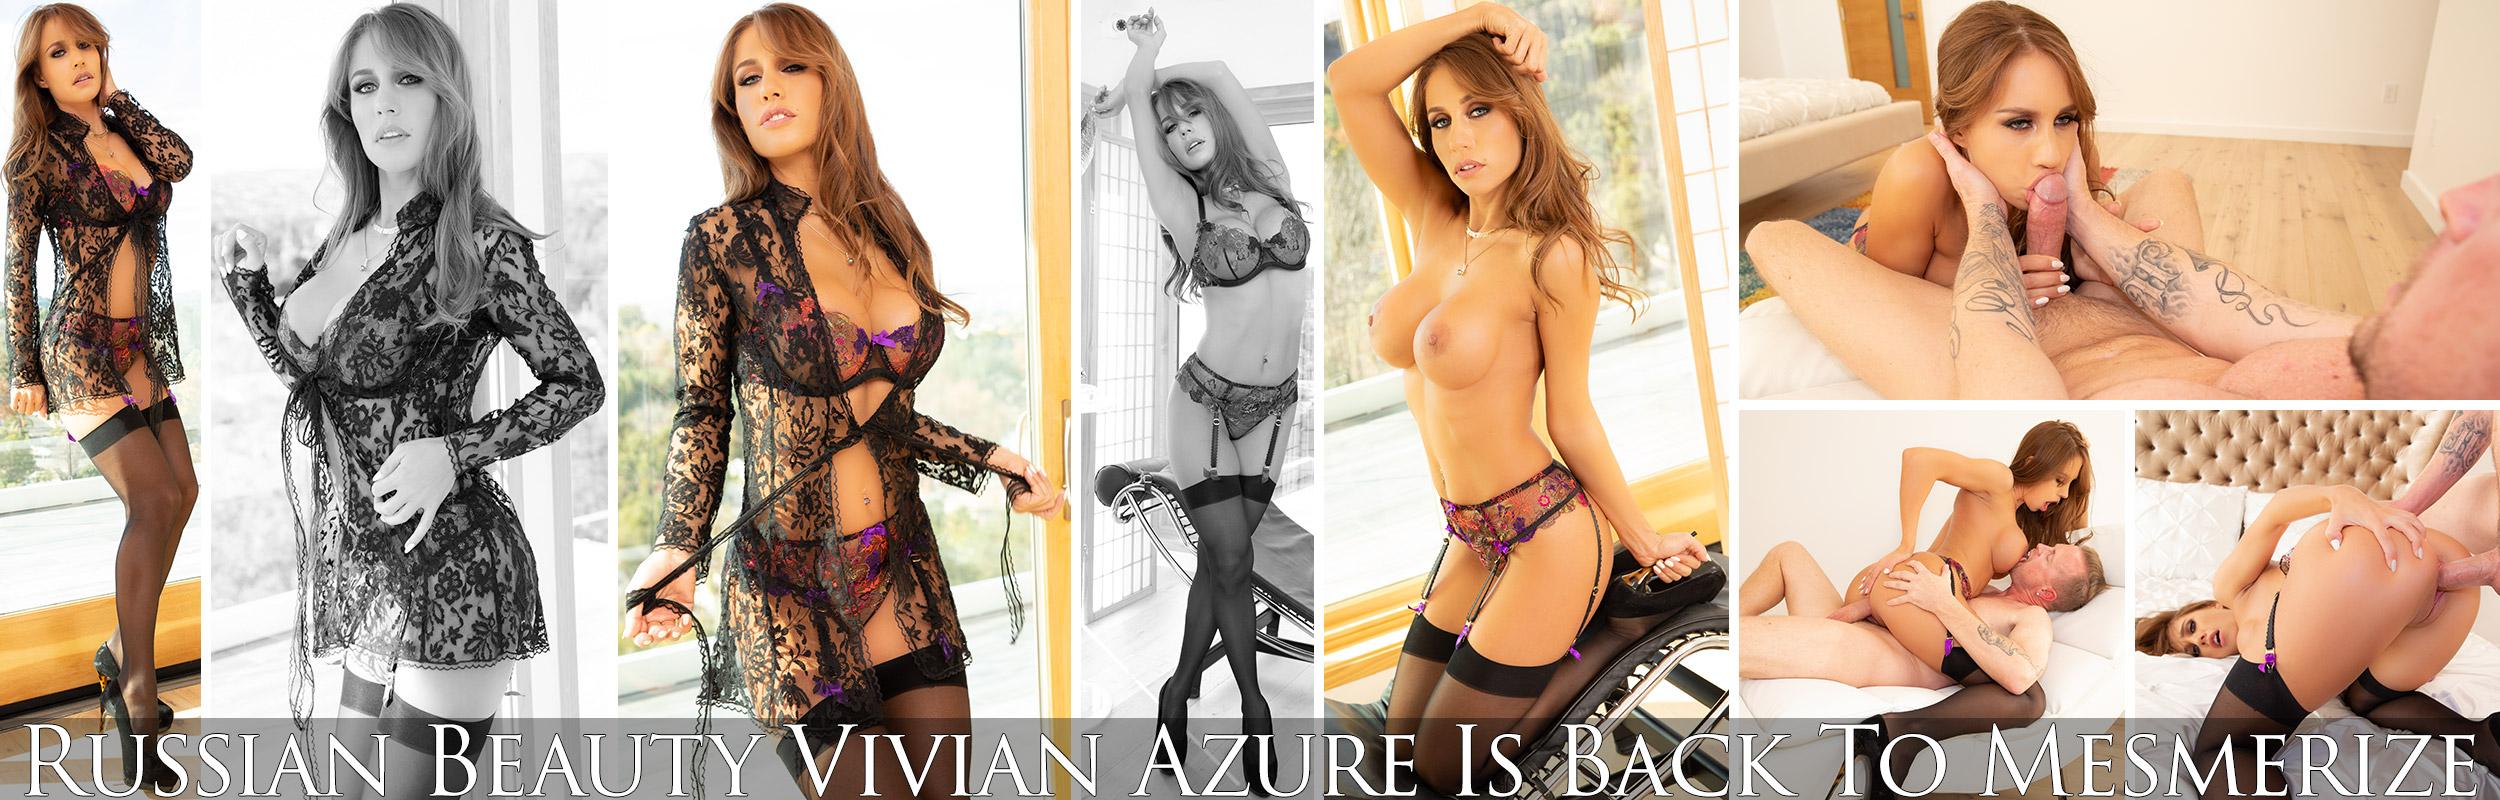 Russian Beauty Vivian Azure Is Back To Mesmerize